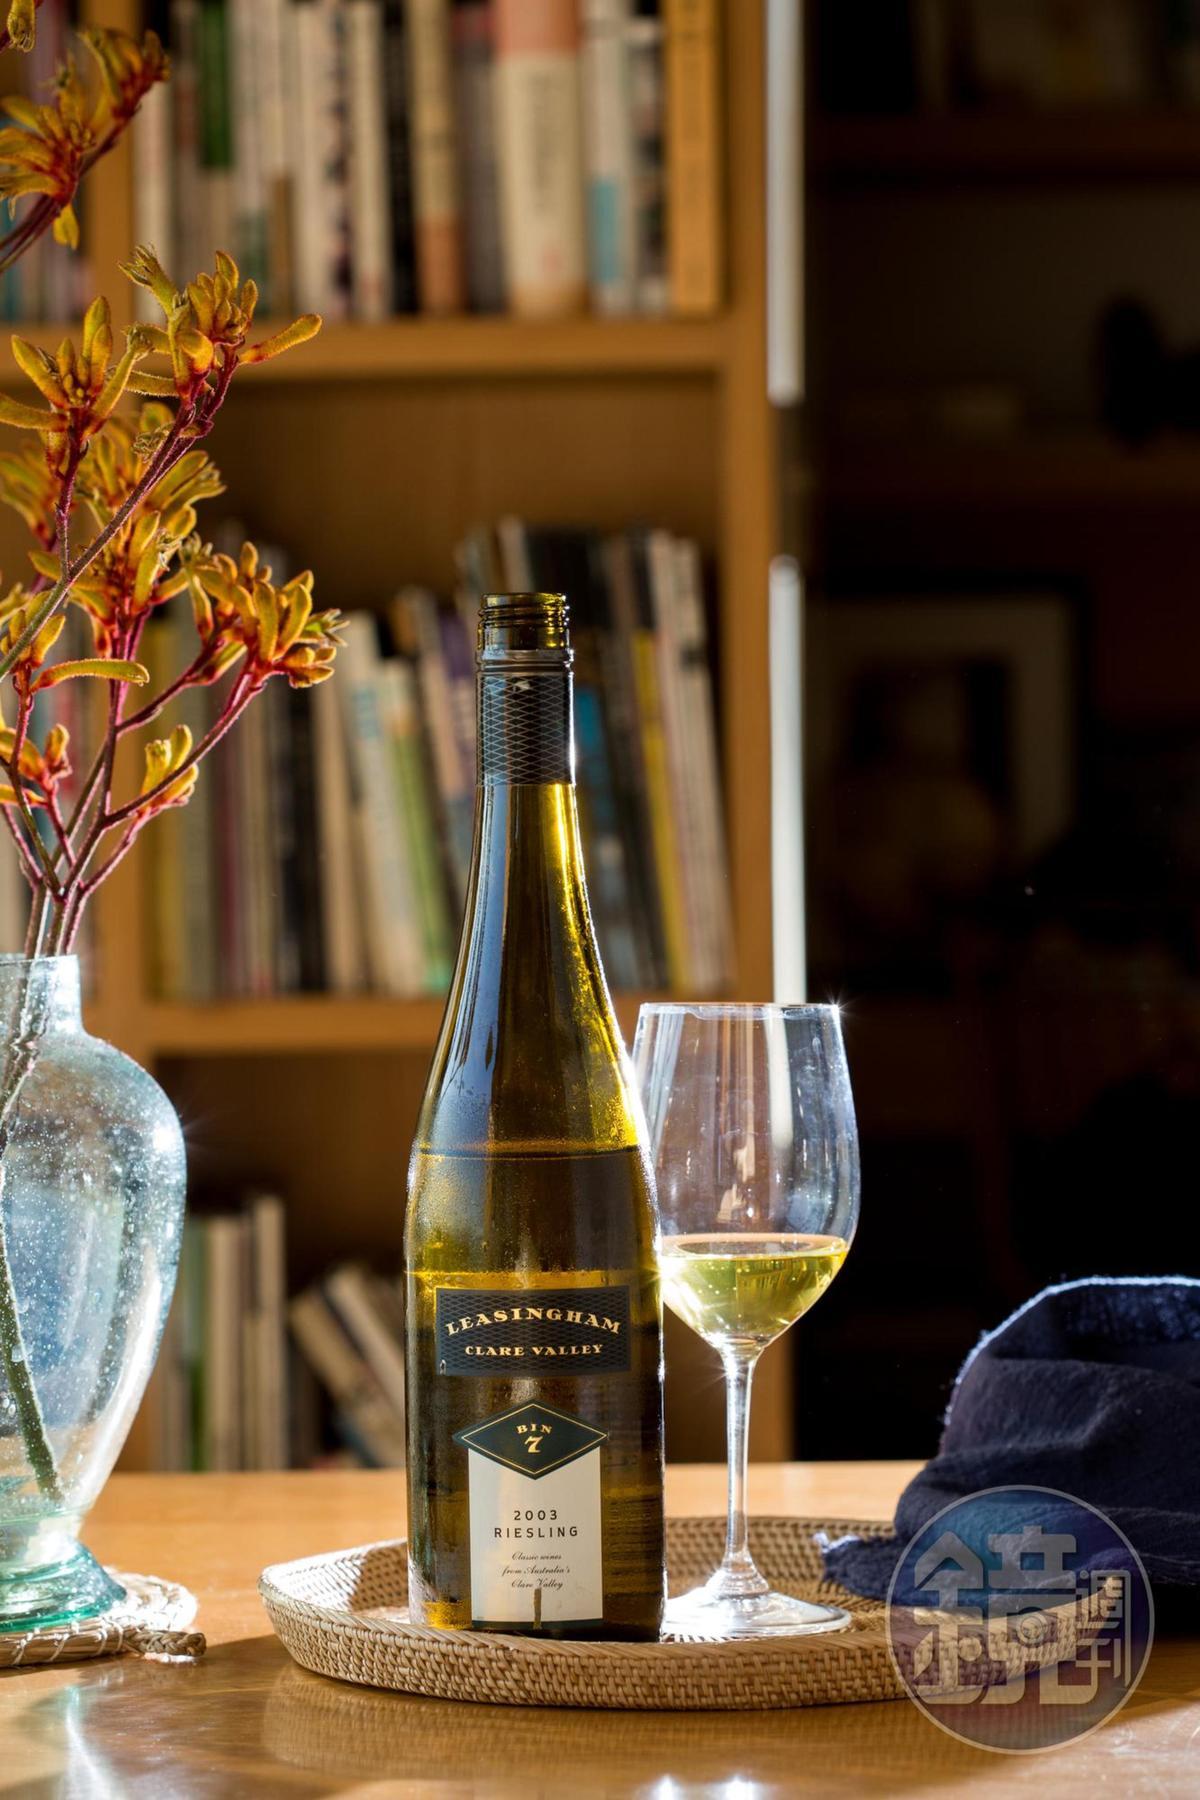 「 Leasingham Bin 7 Riesling, Clare Valley, Australia,2003」,活潑芬香好像萊姆汁。(長榮酒專停止代理,林裕森私人藏酒)